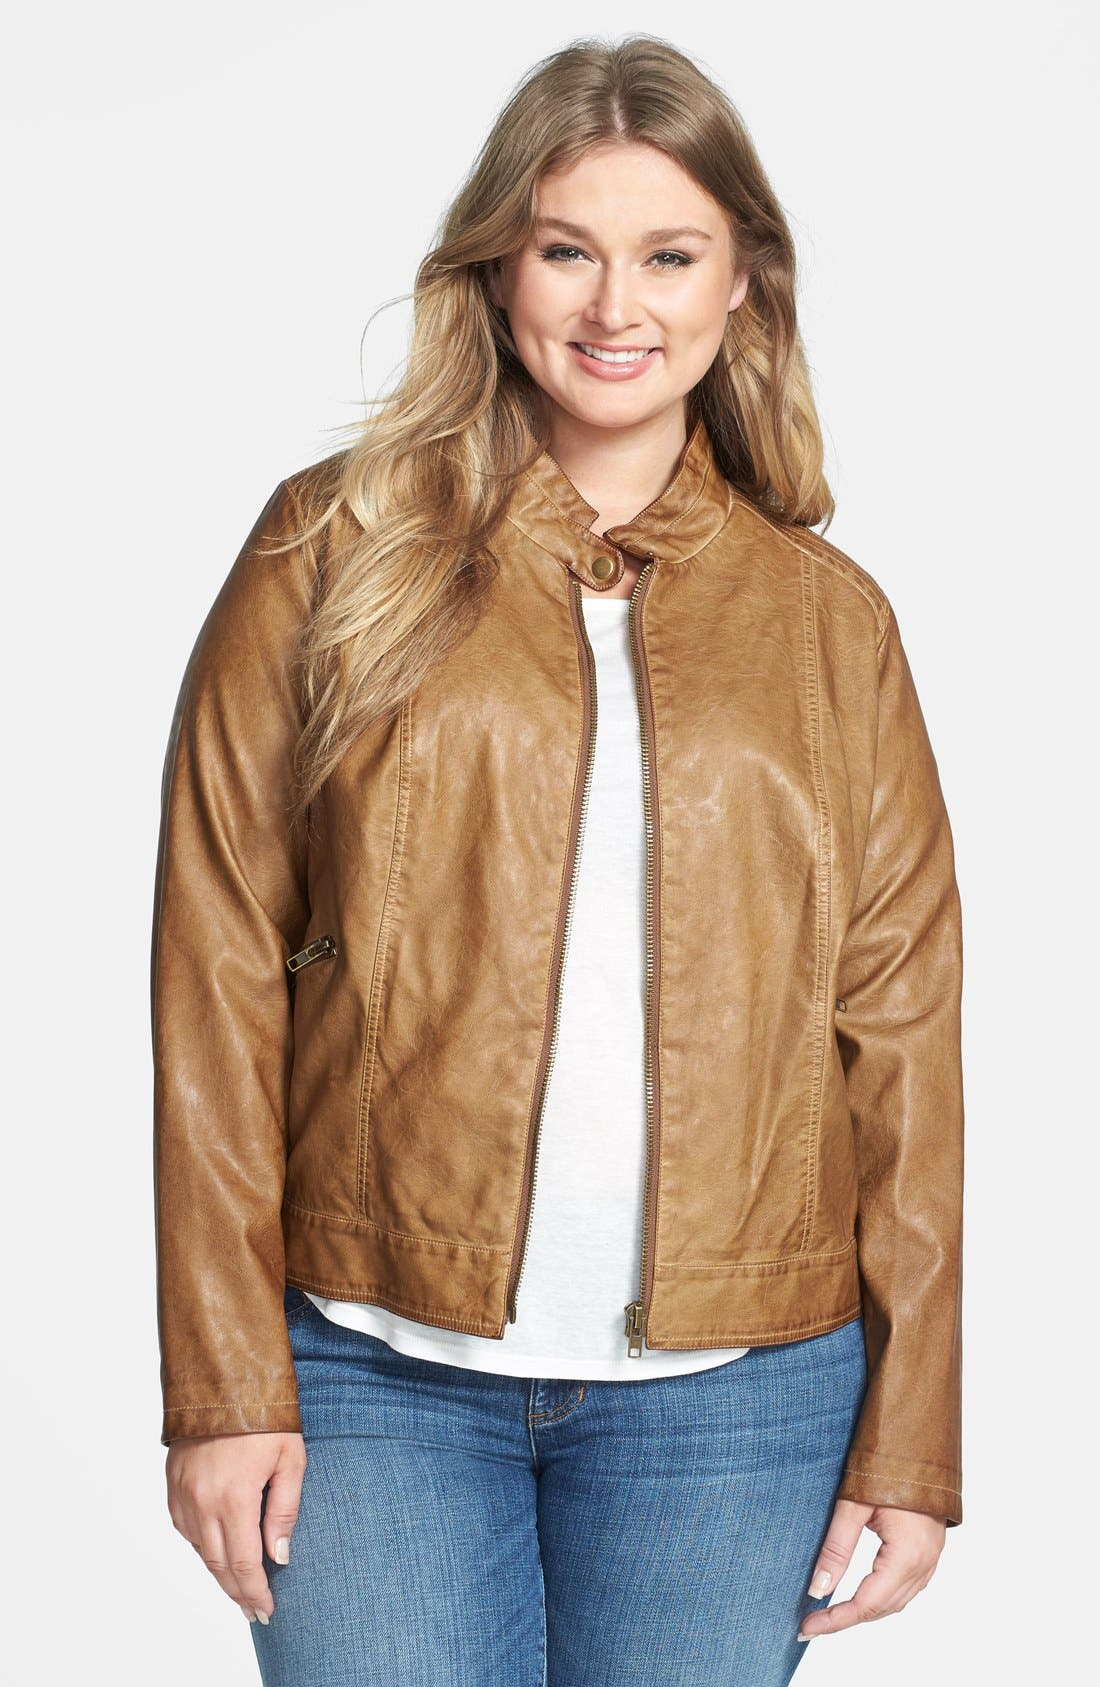 Alternate Image 1 Selected - BB Dakota 'Janeen' Faux Leather Moto Jacket (Plus Size)